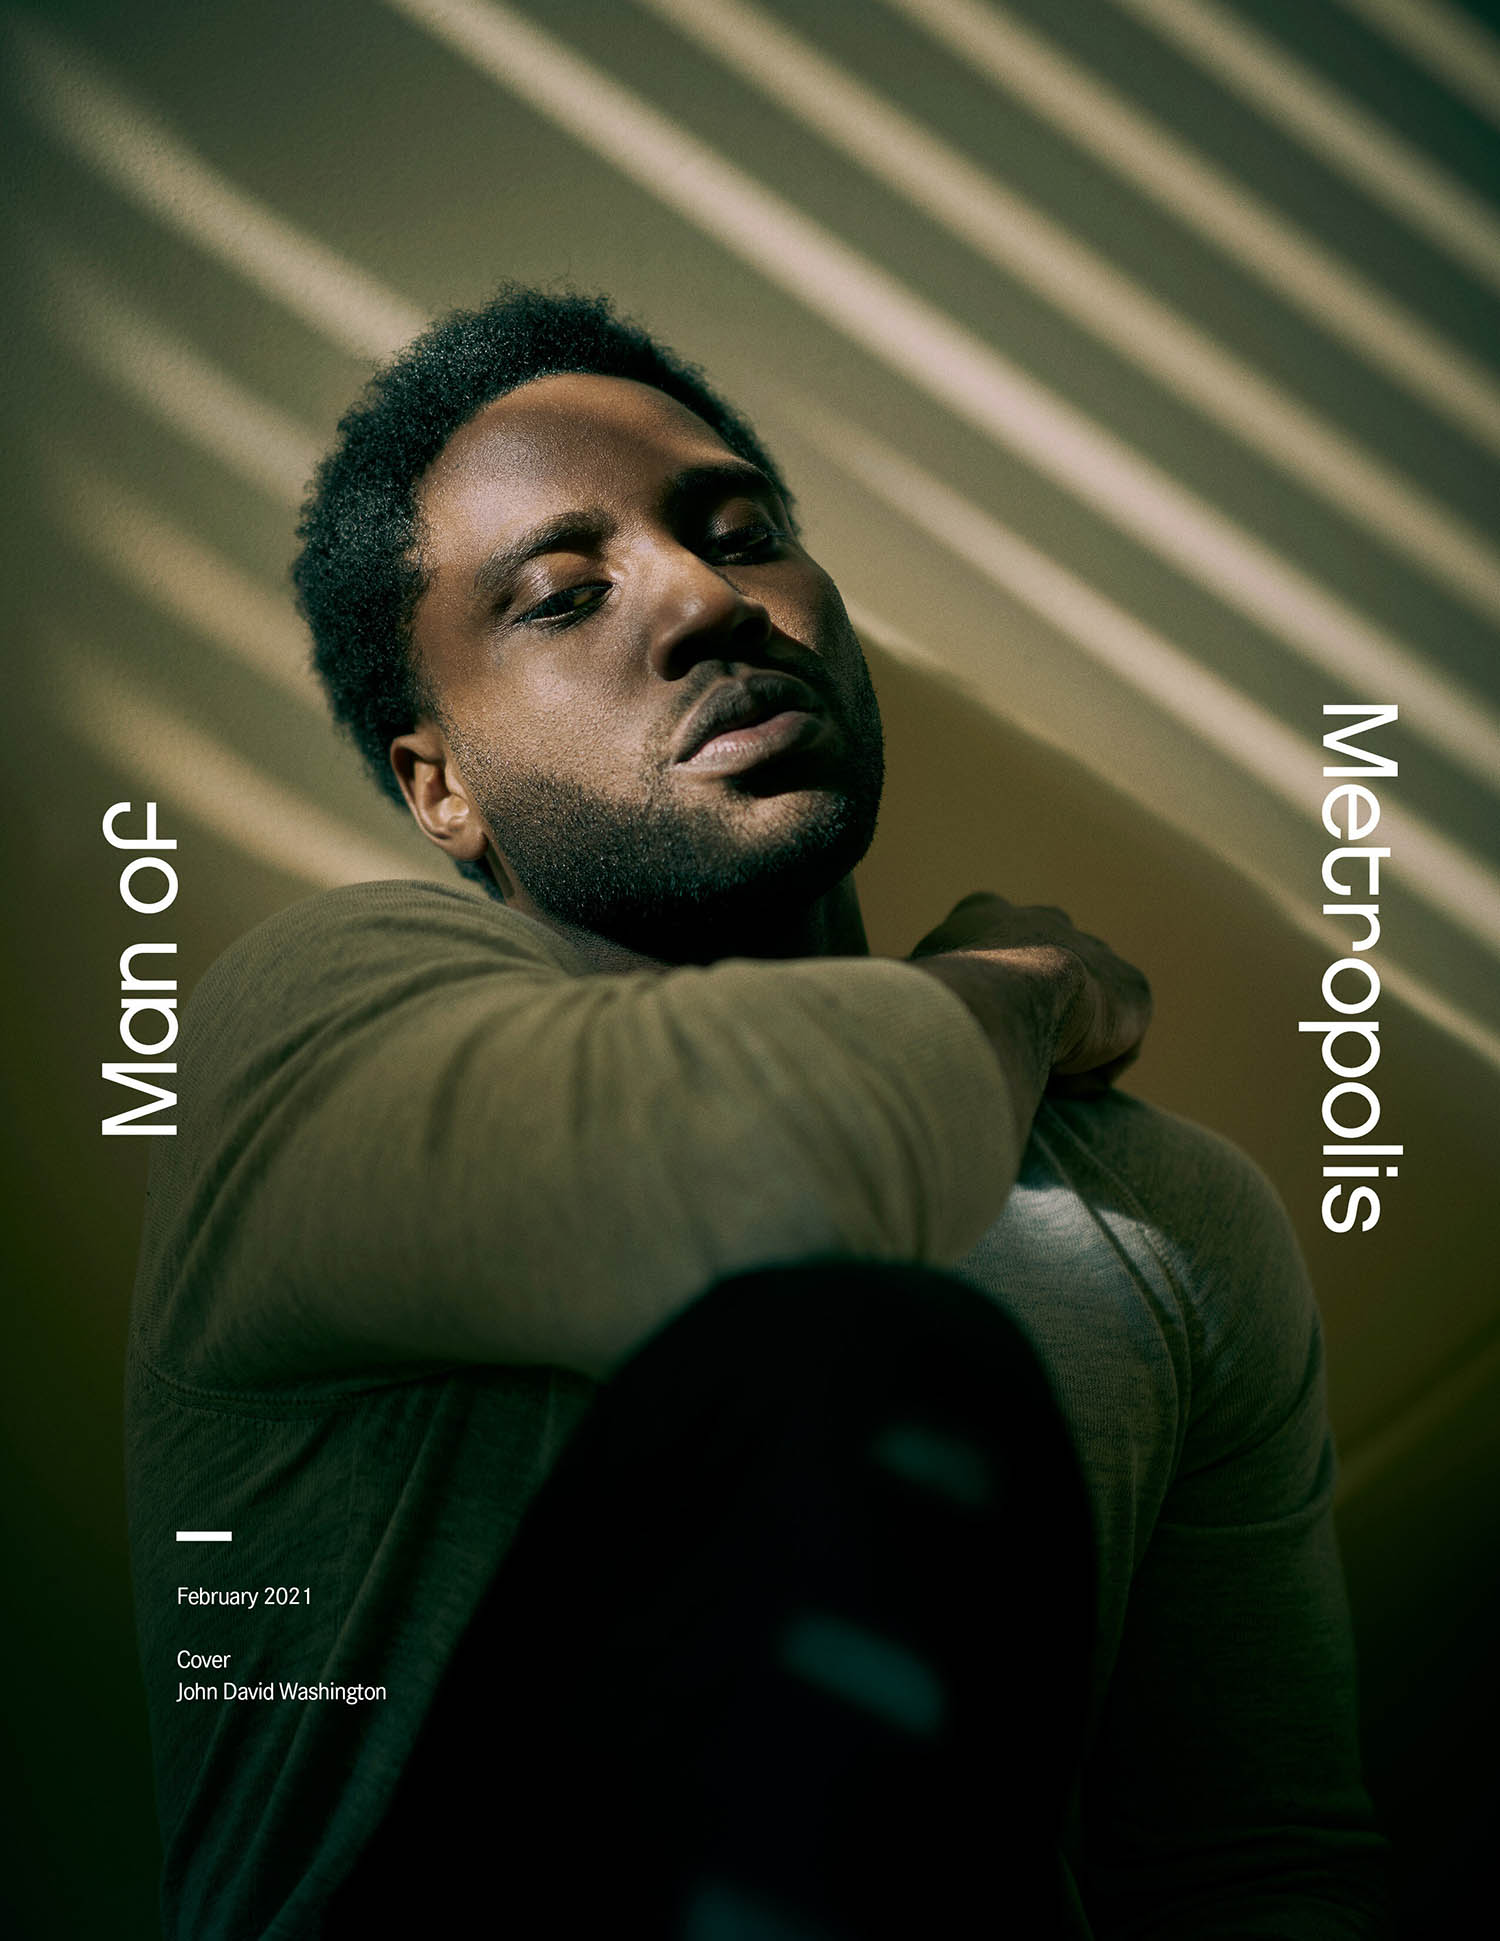 John David Washington covers Man of Metropolis February 2021 by Dominic Miller